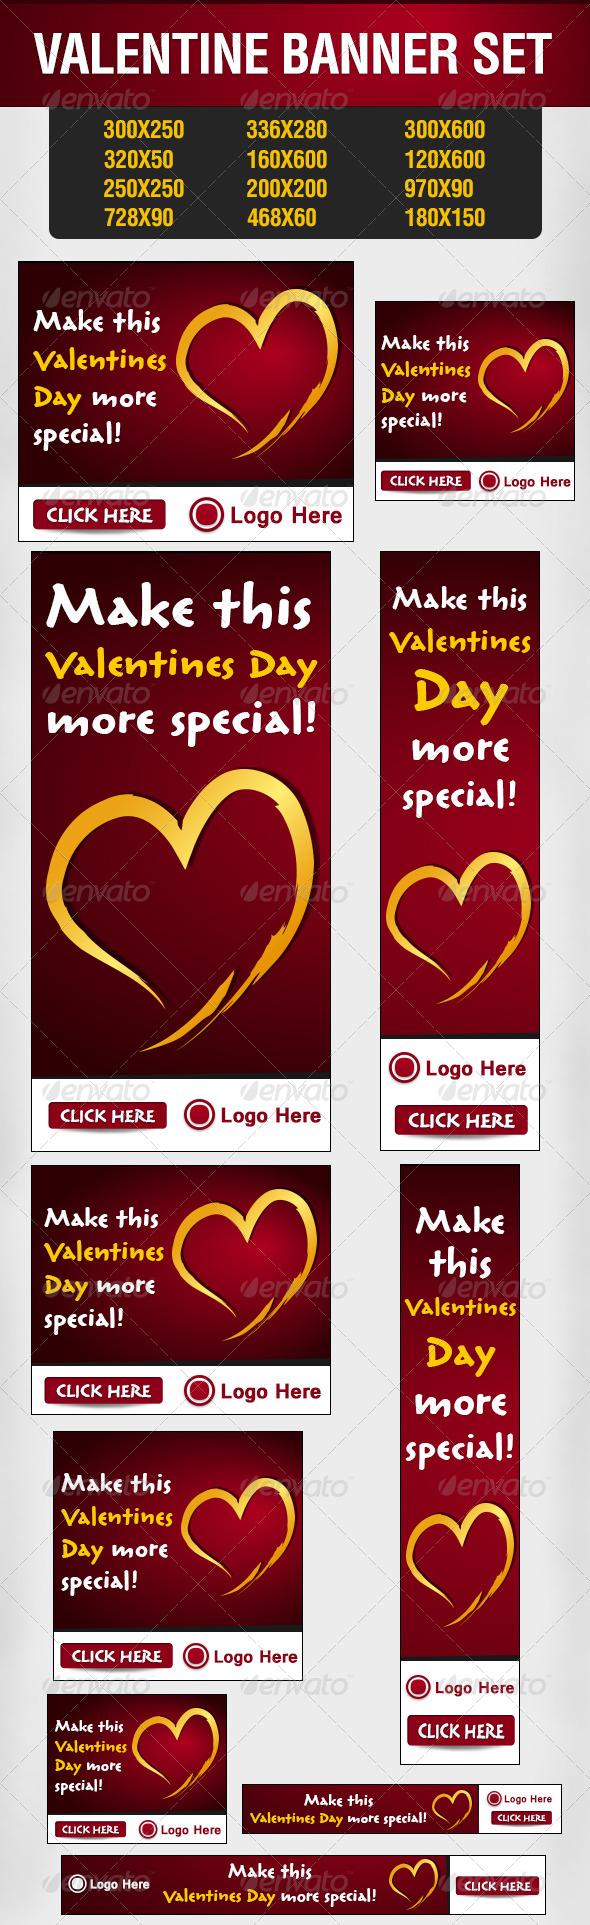 GraphicRiver Valentine Banner Set 6462290